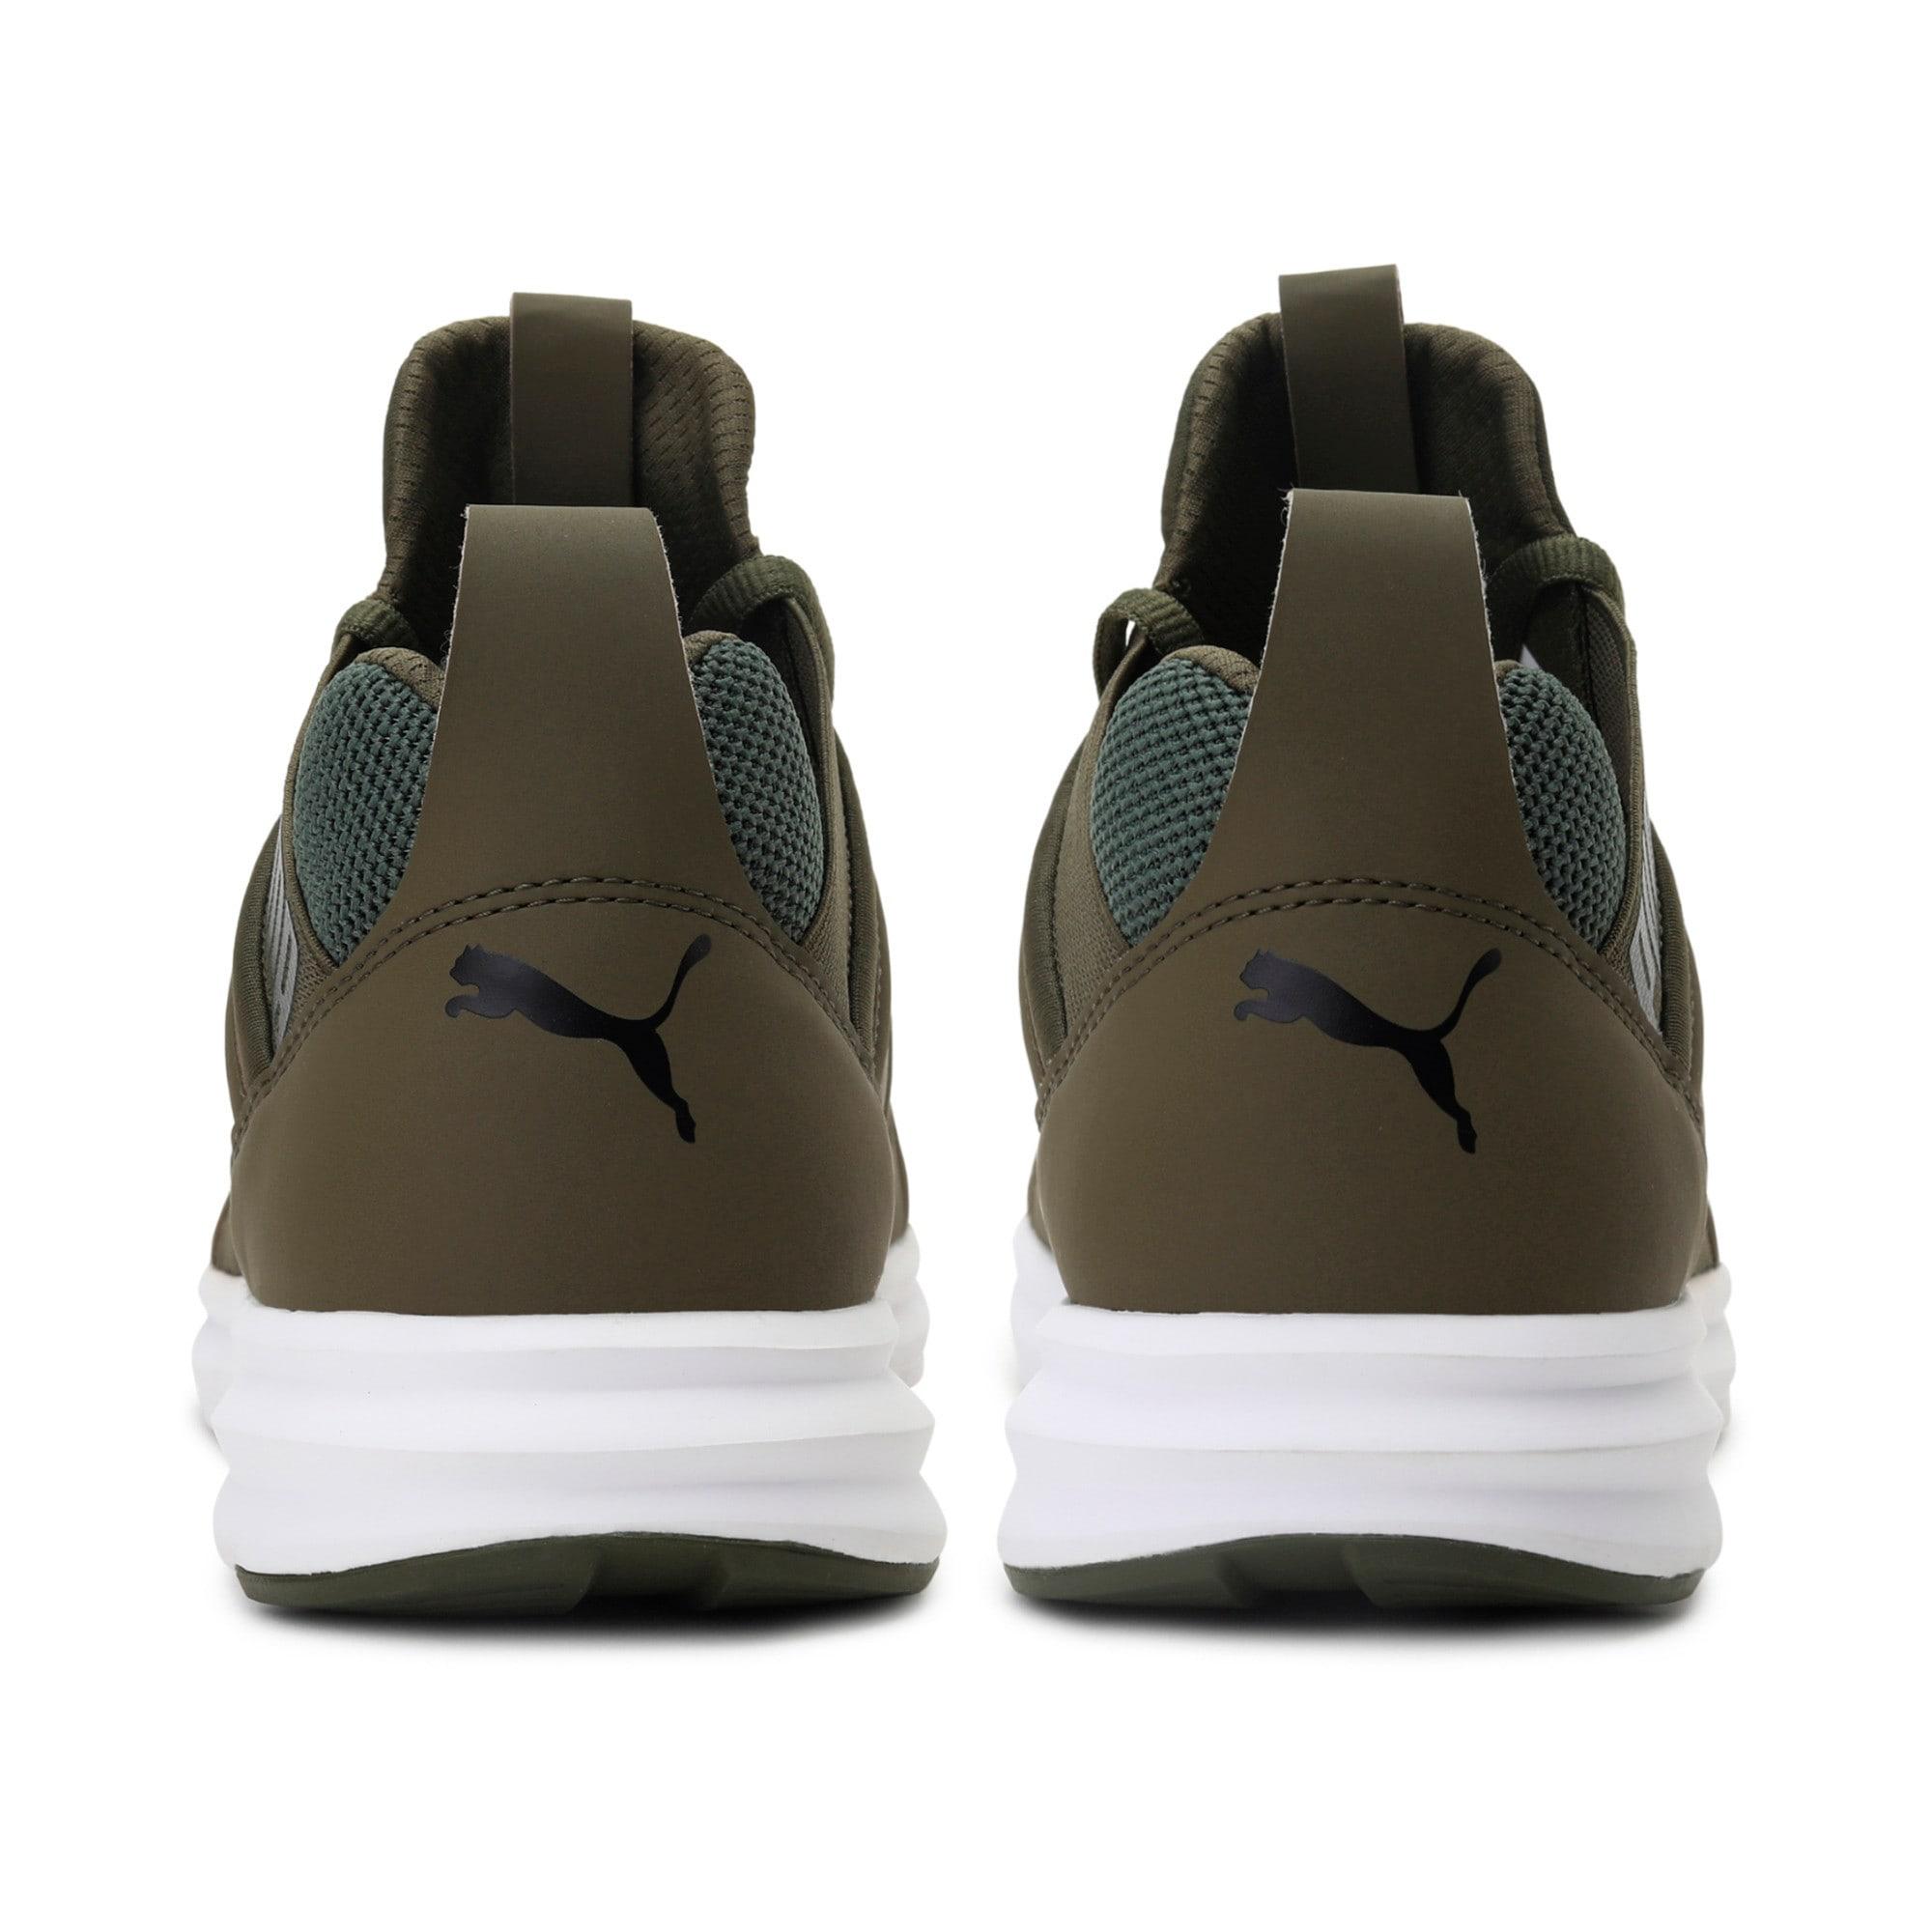 Thumbnail 3 of Enzo Mesh Men's Running Shoes, Olive Night-Puma White, medium-IND